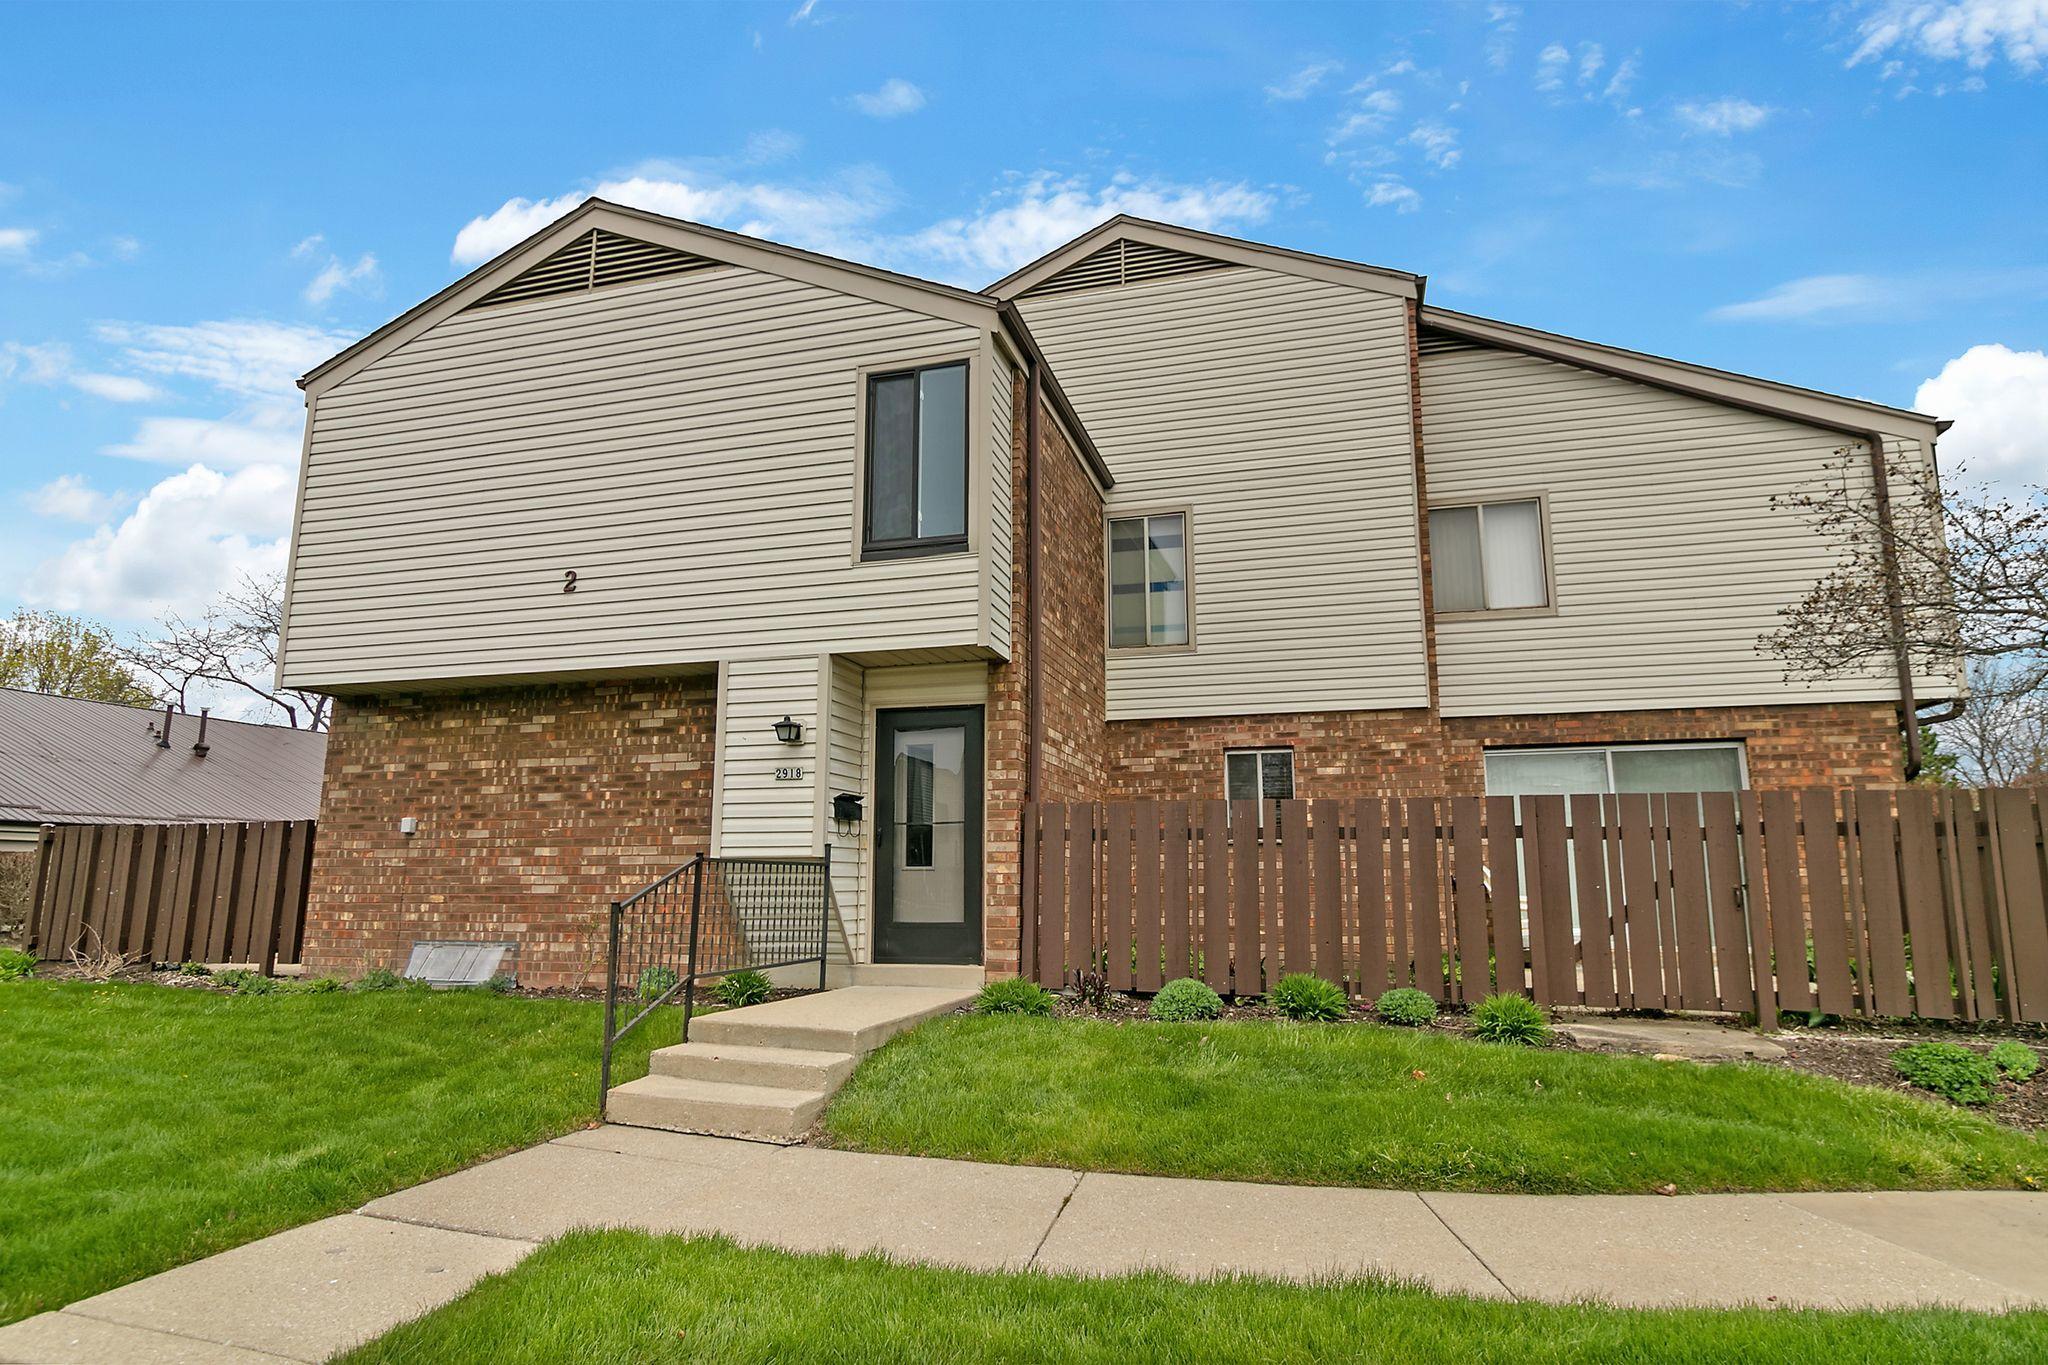 2918 14th Ln, Kenosha, Wisconsin 53140, 3 Bedrooms Bedrooms, 7 Rooms Rooms,1 BathroomBathrooms,Condominiums,For Sale,14th Ln,1,1687656